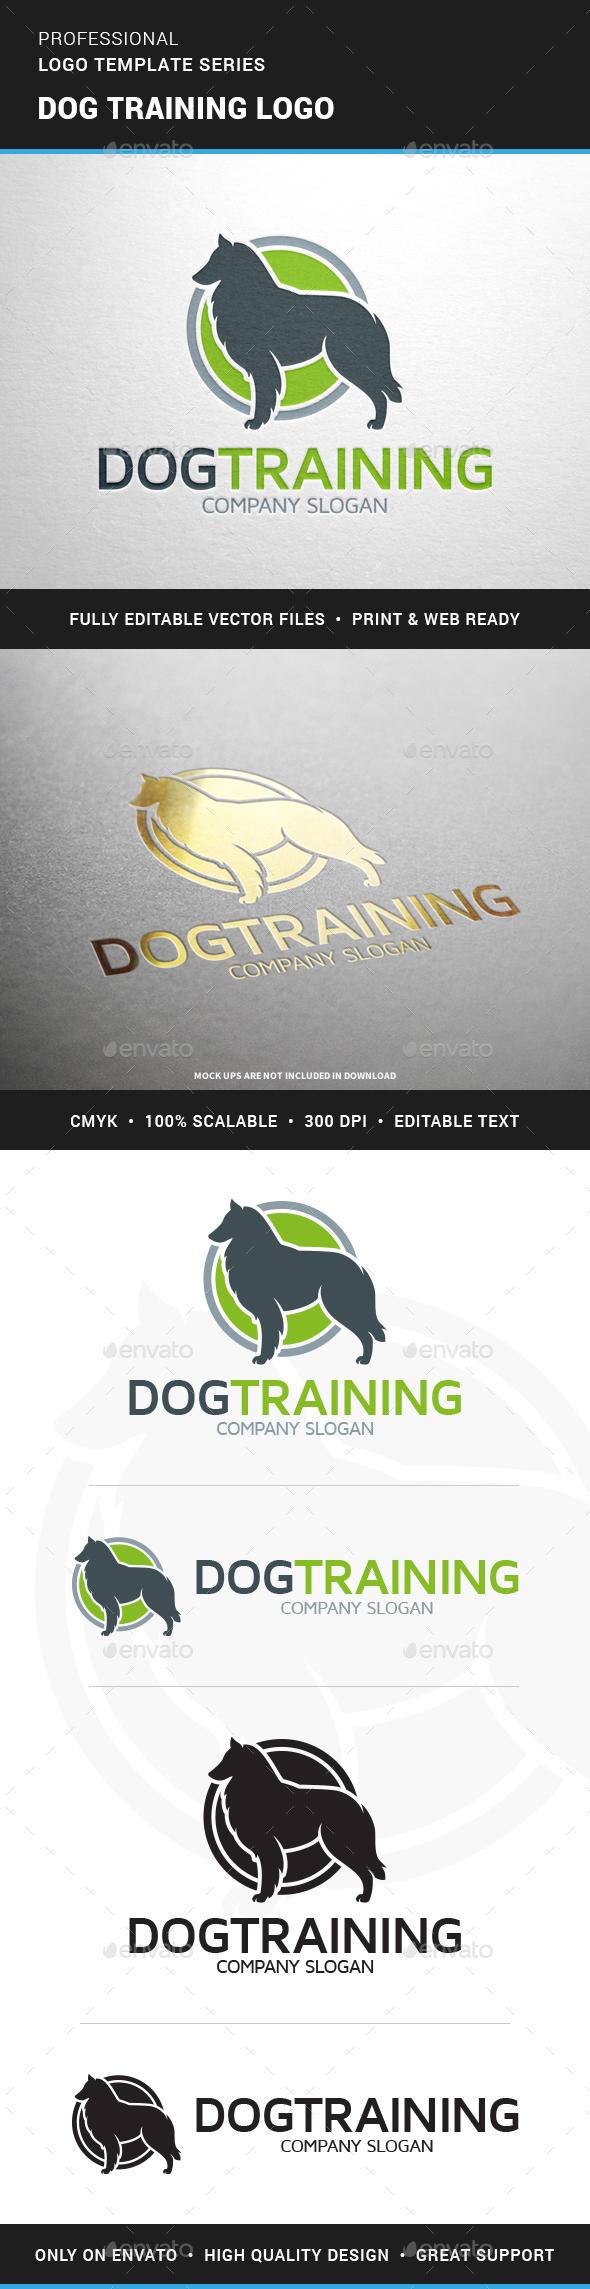 Dog Training Logo Template - Animals Logo Templates